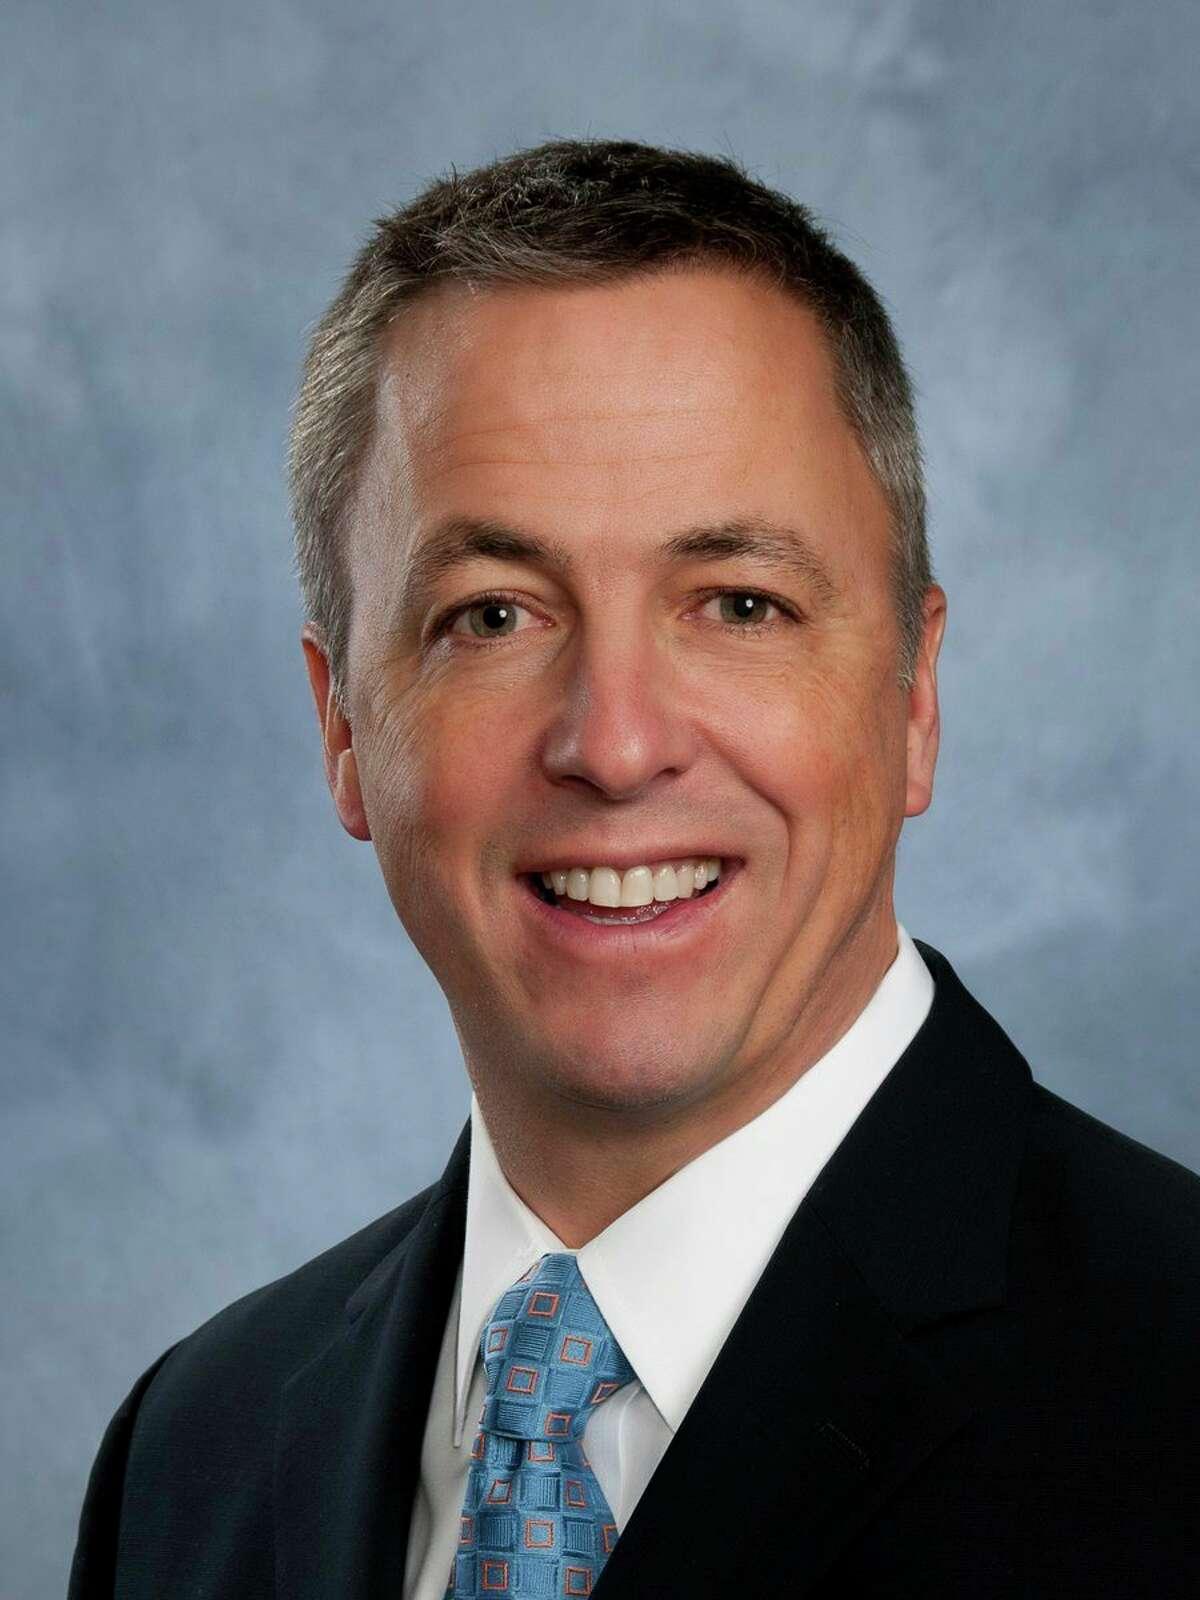 Tim Hausbeck